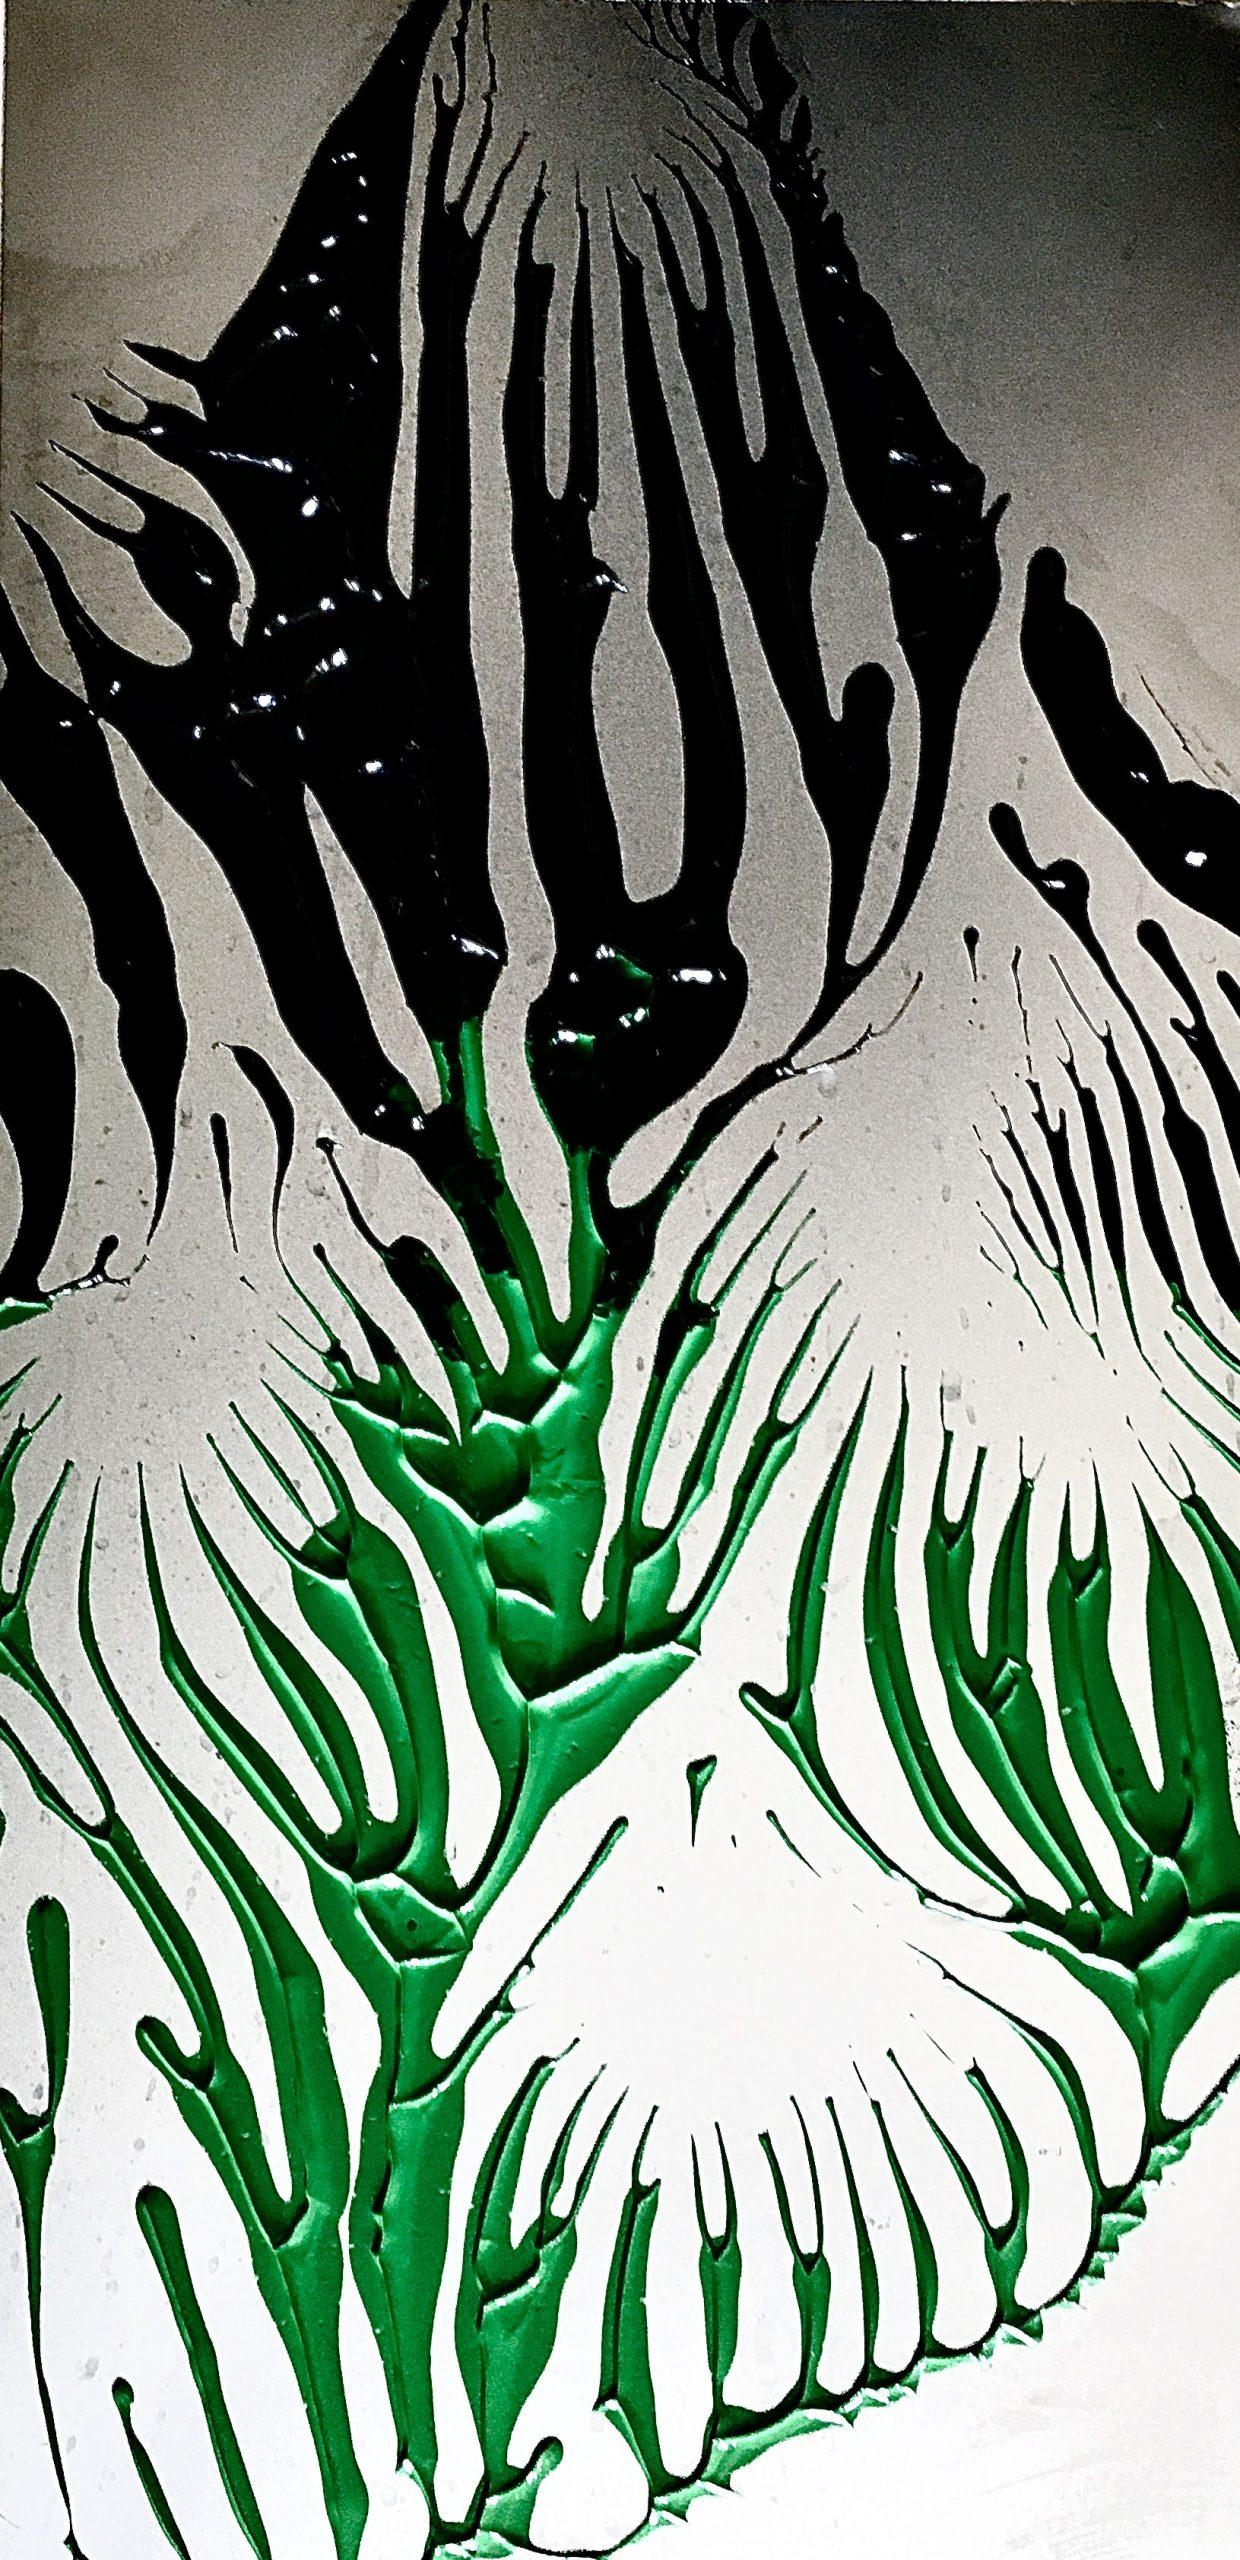 "Abstract:Imprint, Roots1"", acrylics on zinc, 50 x 25 cm, 2021"